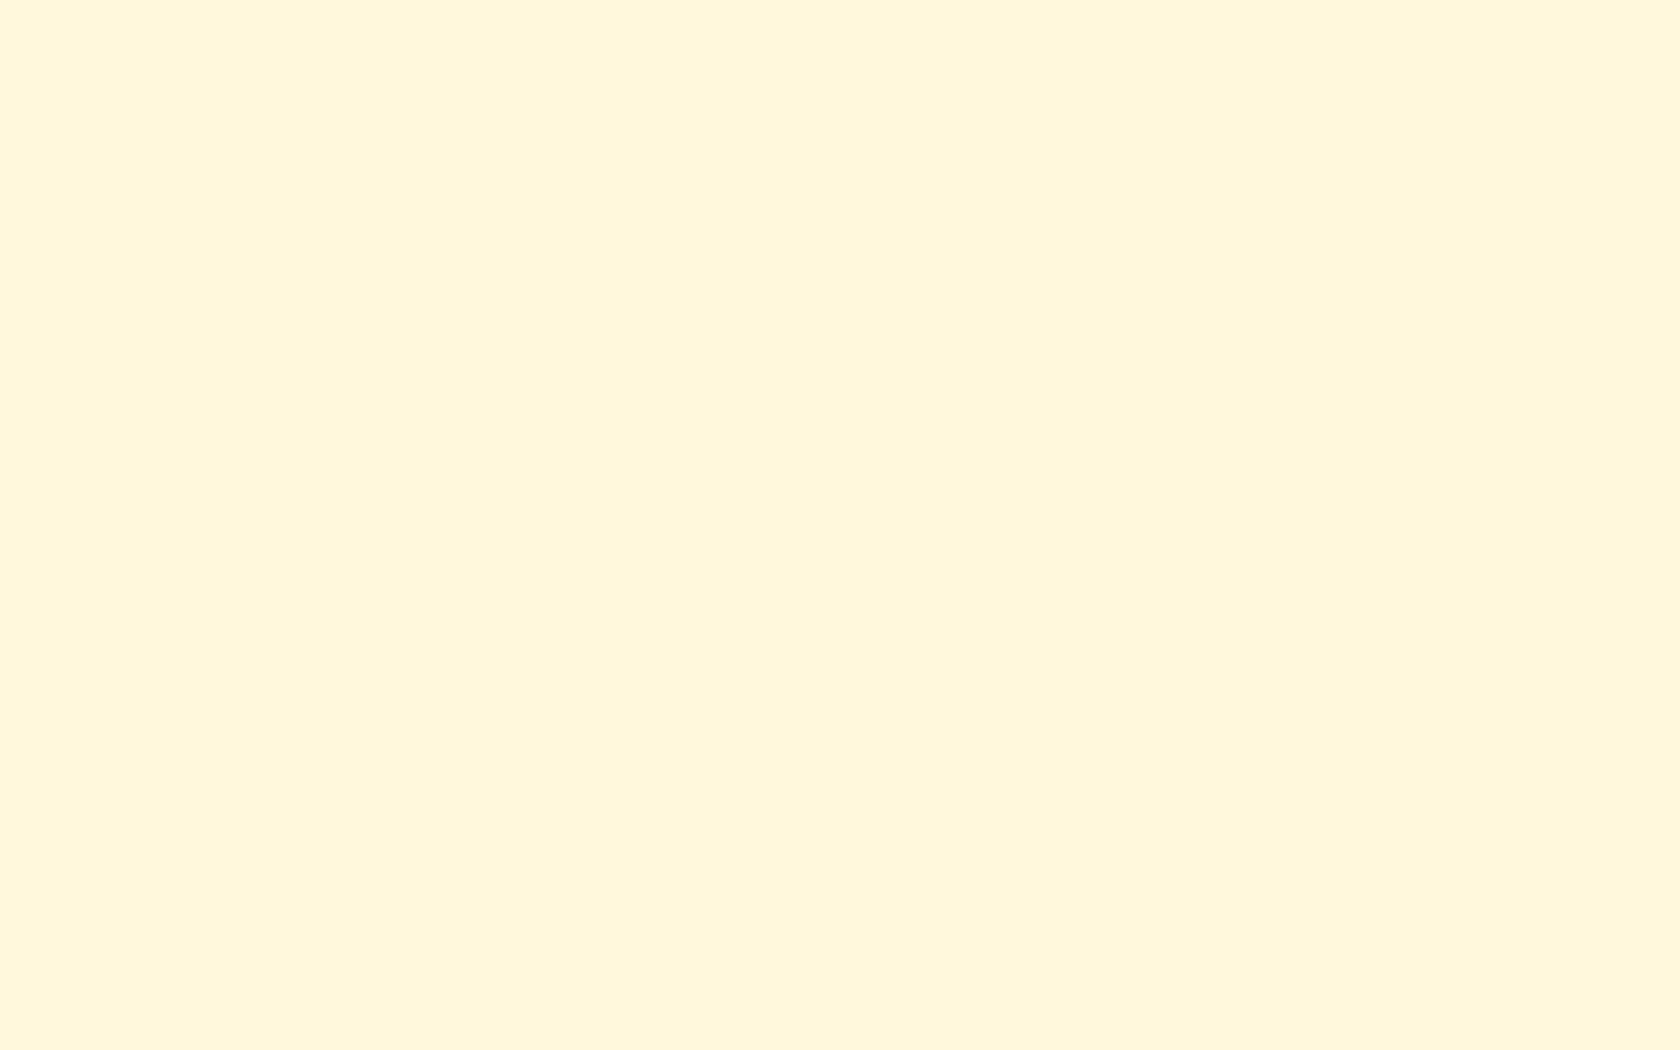 1680x1050 Cornsilk Solid Color Background